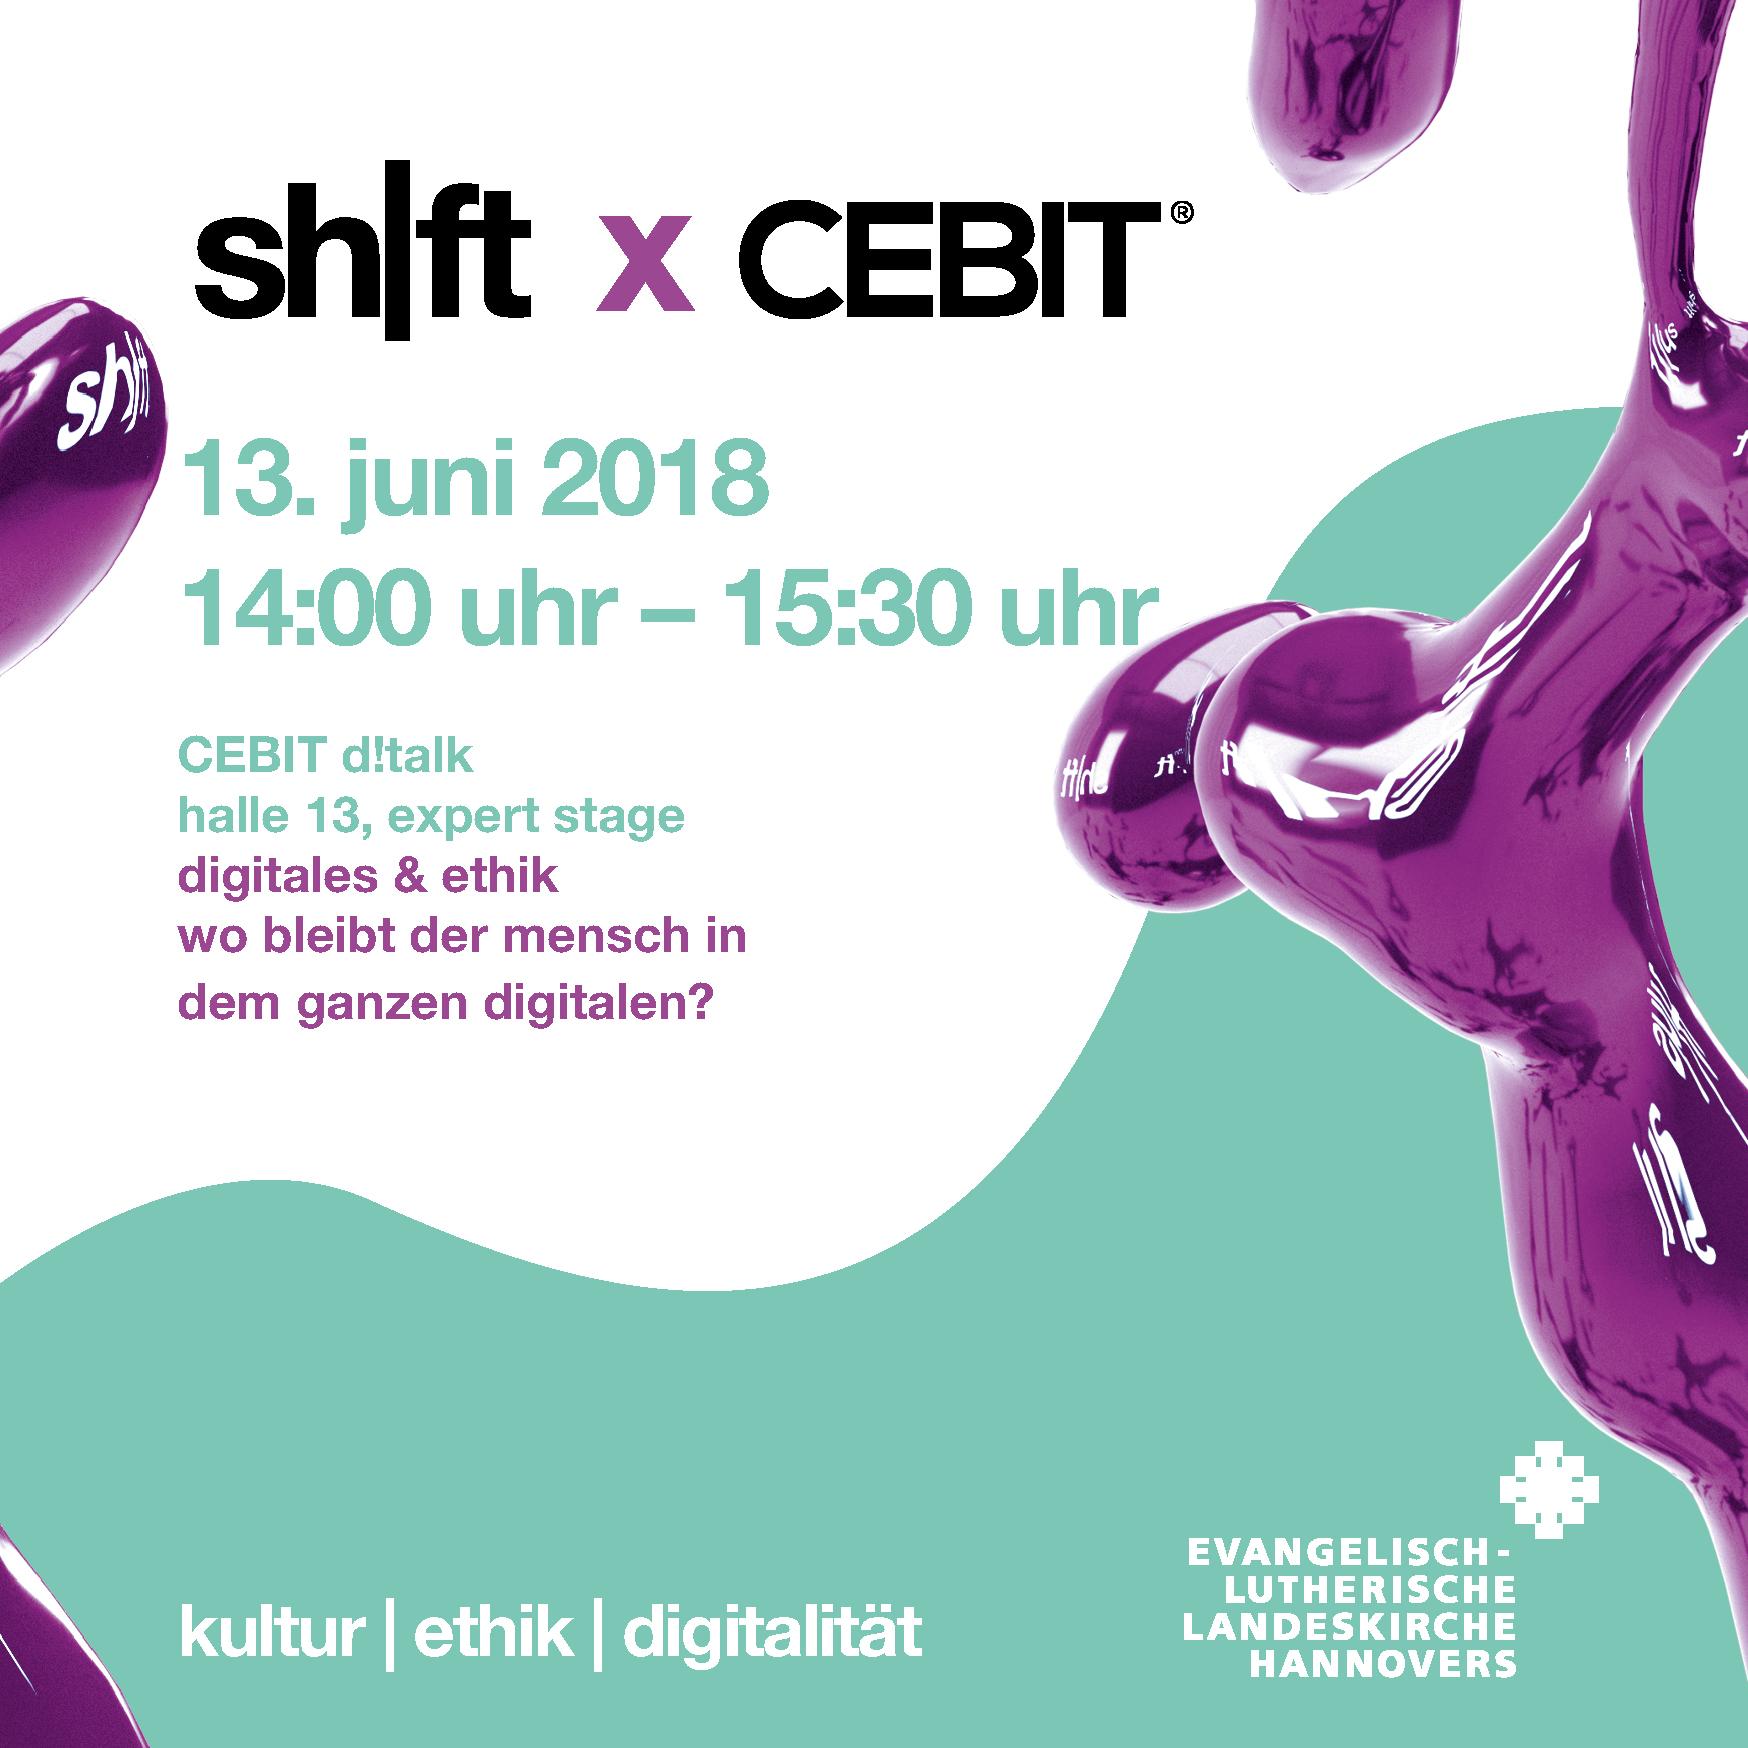 shiftxcebit2018.jpg